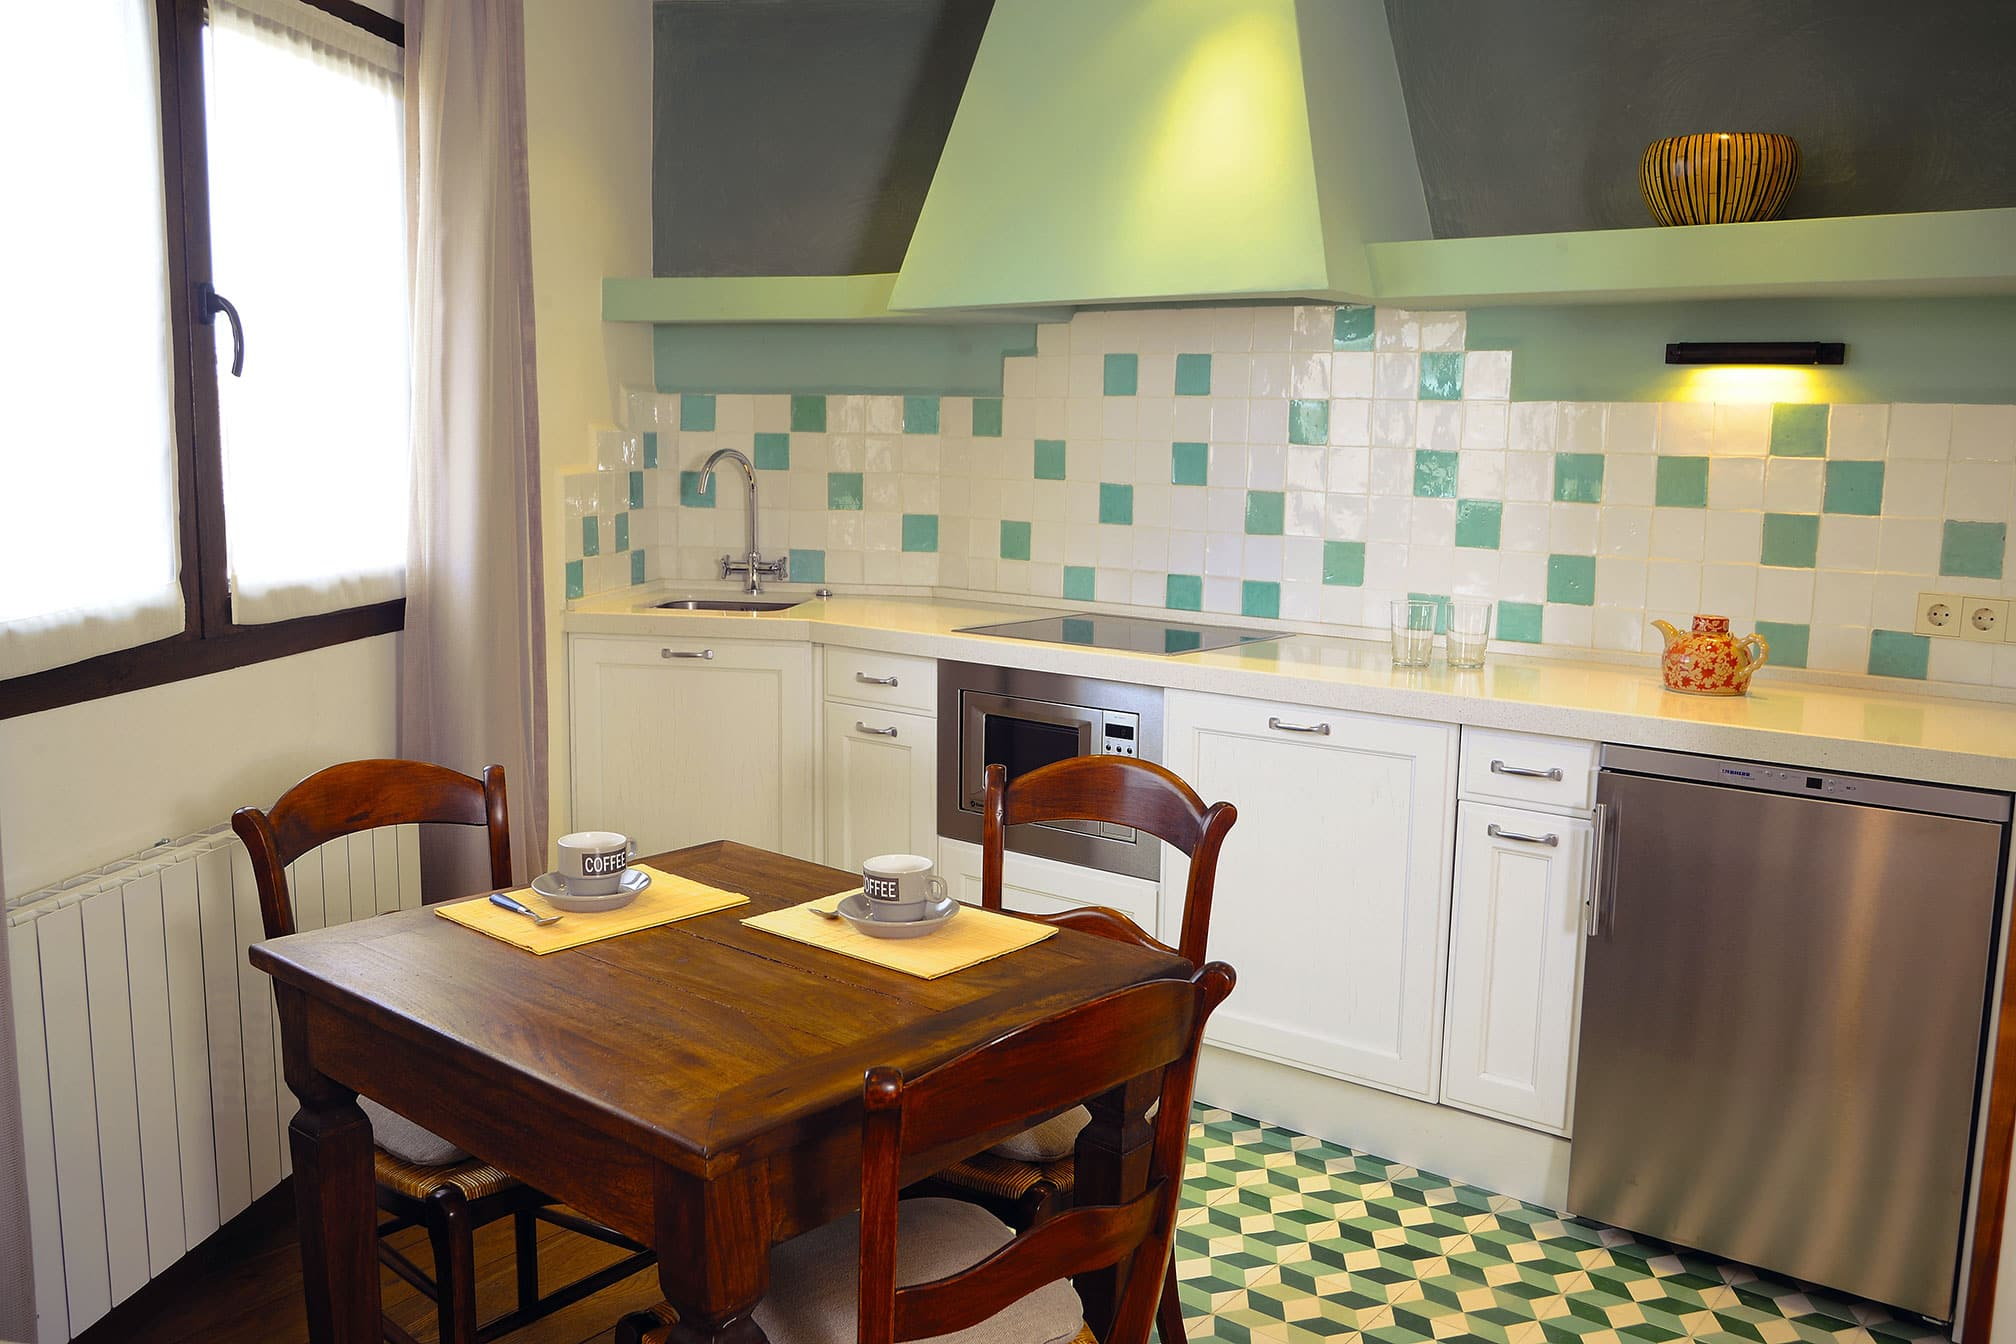 Apartamento Rural en Segovia - La Rinconada